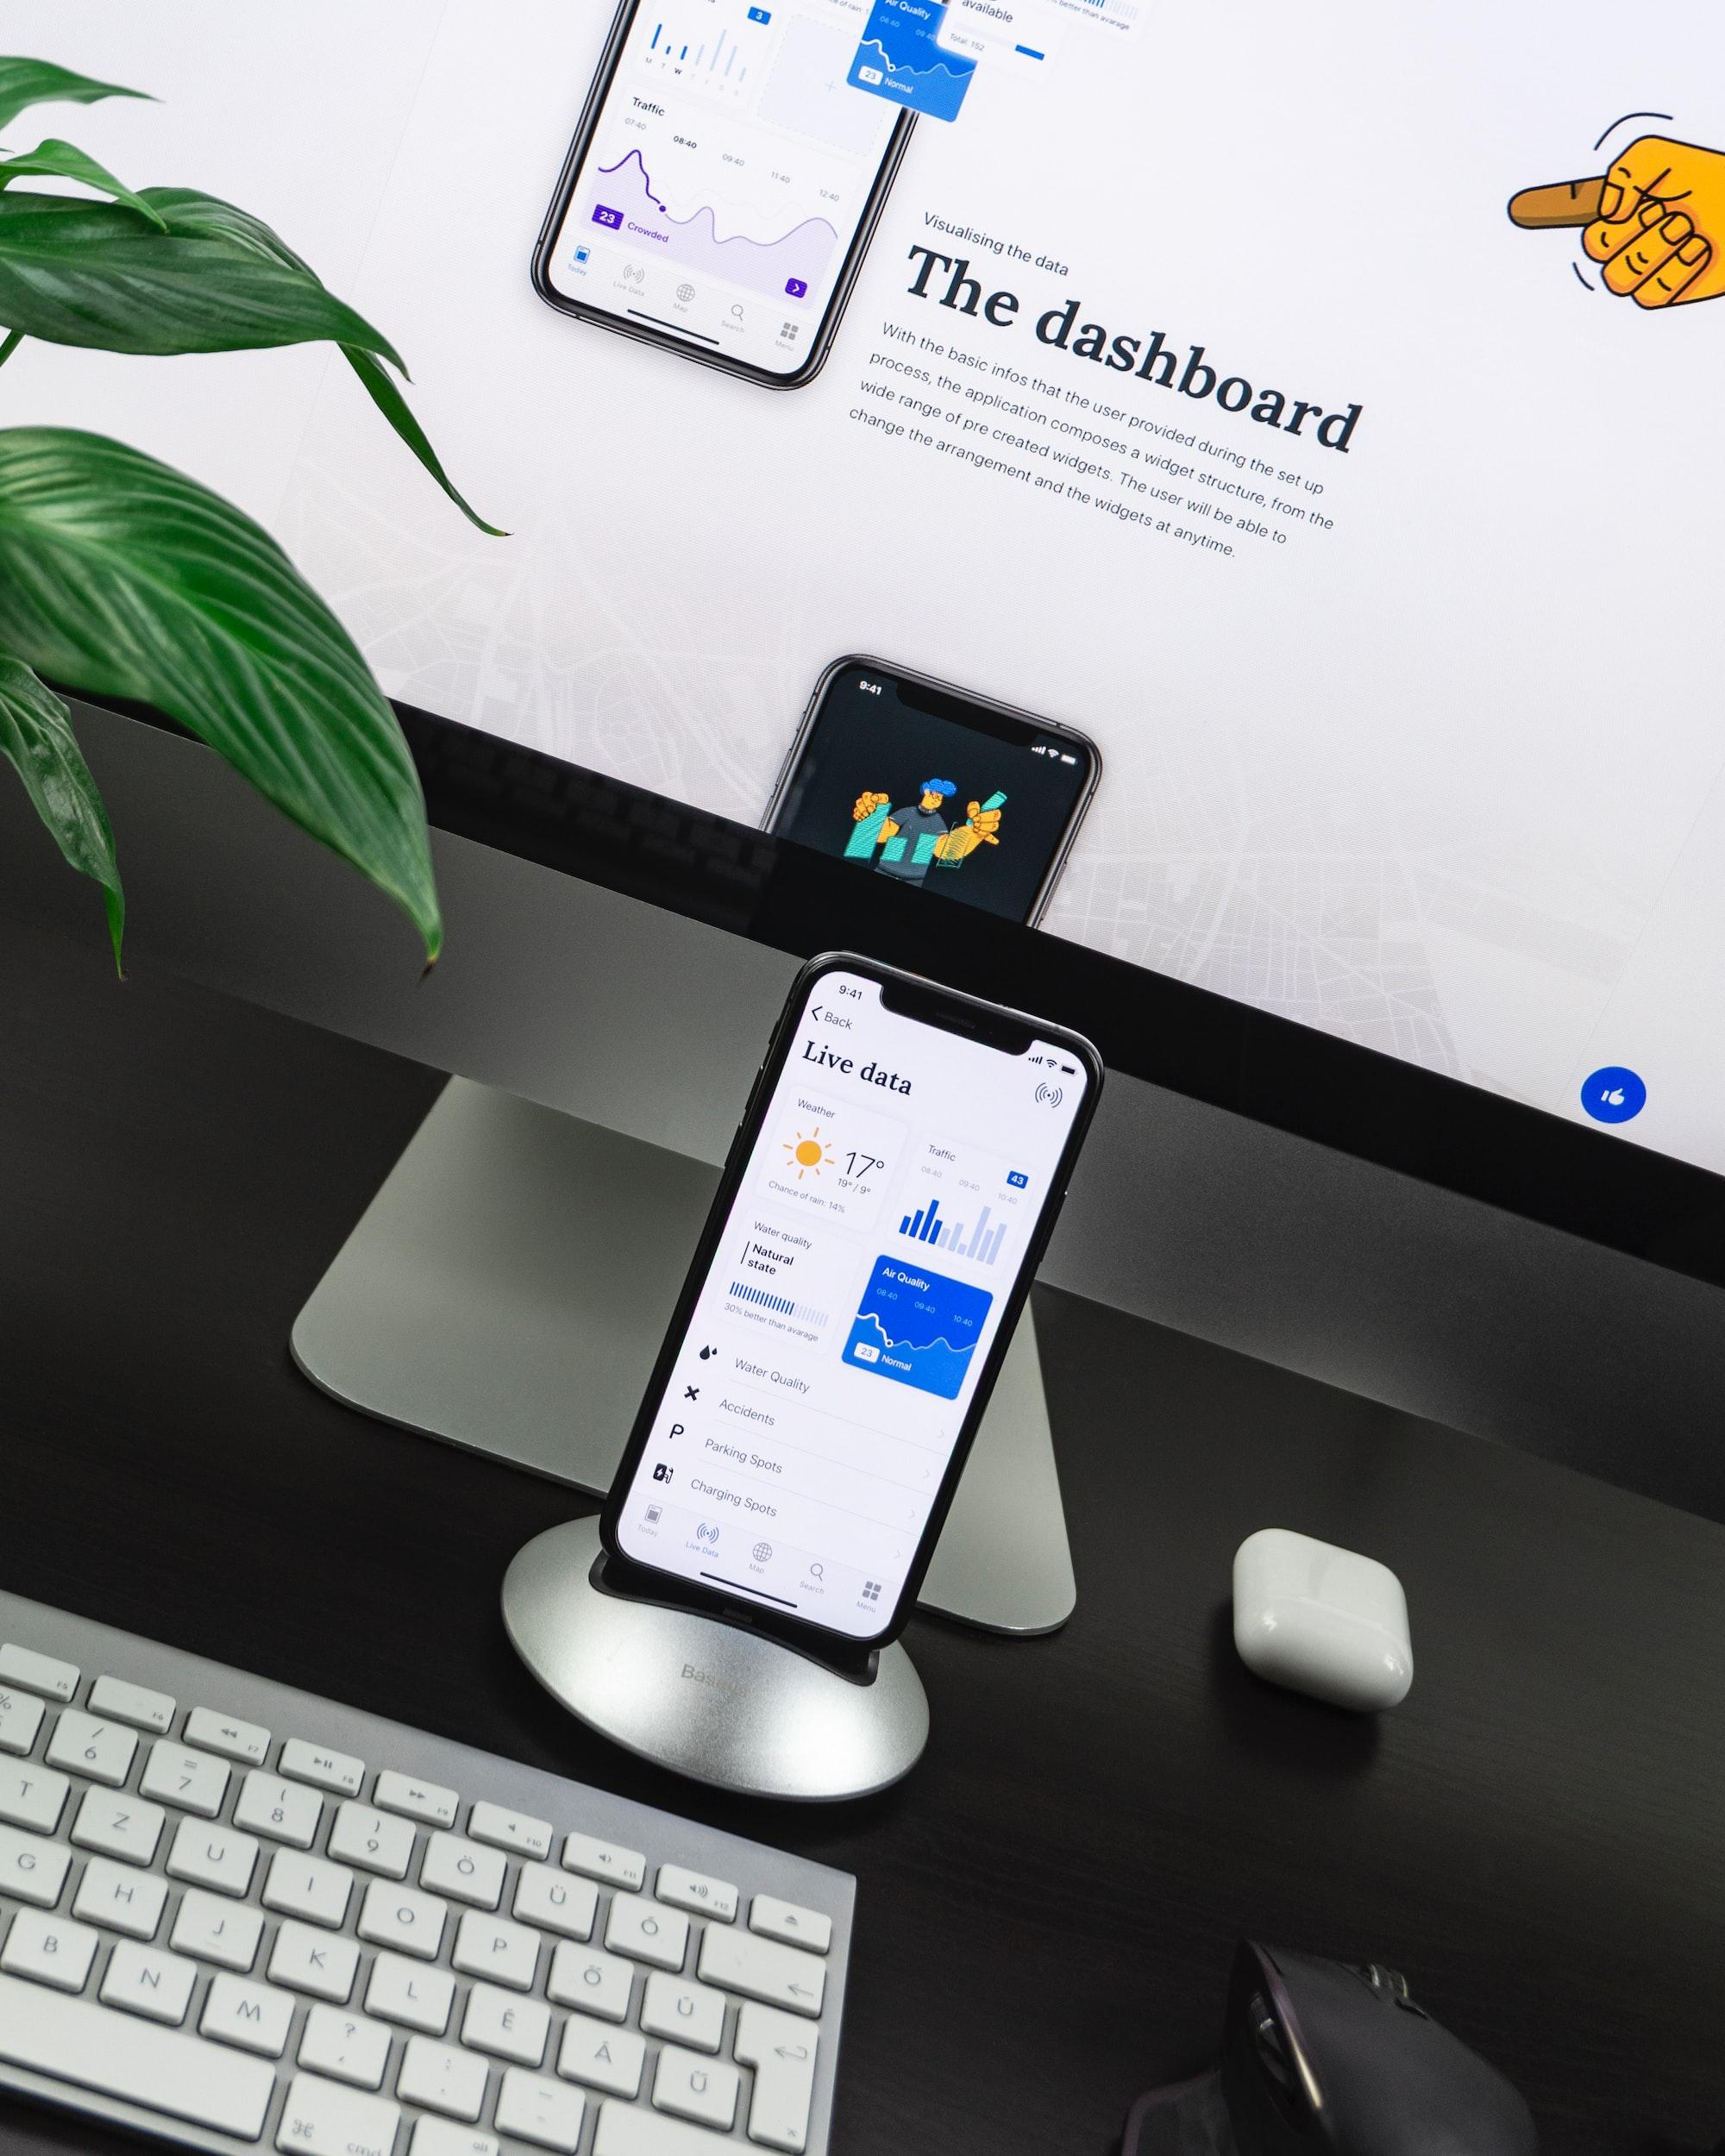 No-Code / Low Code Development tools